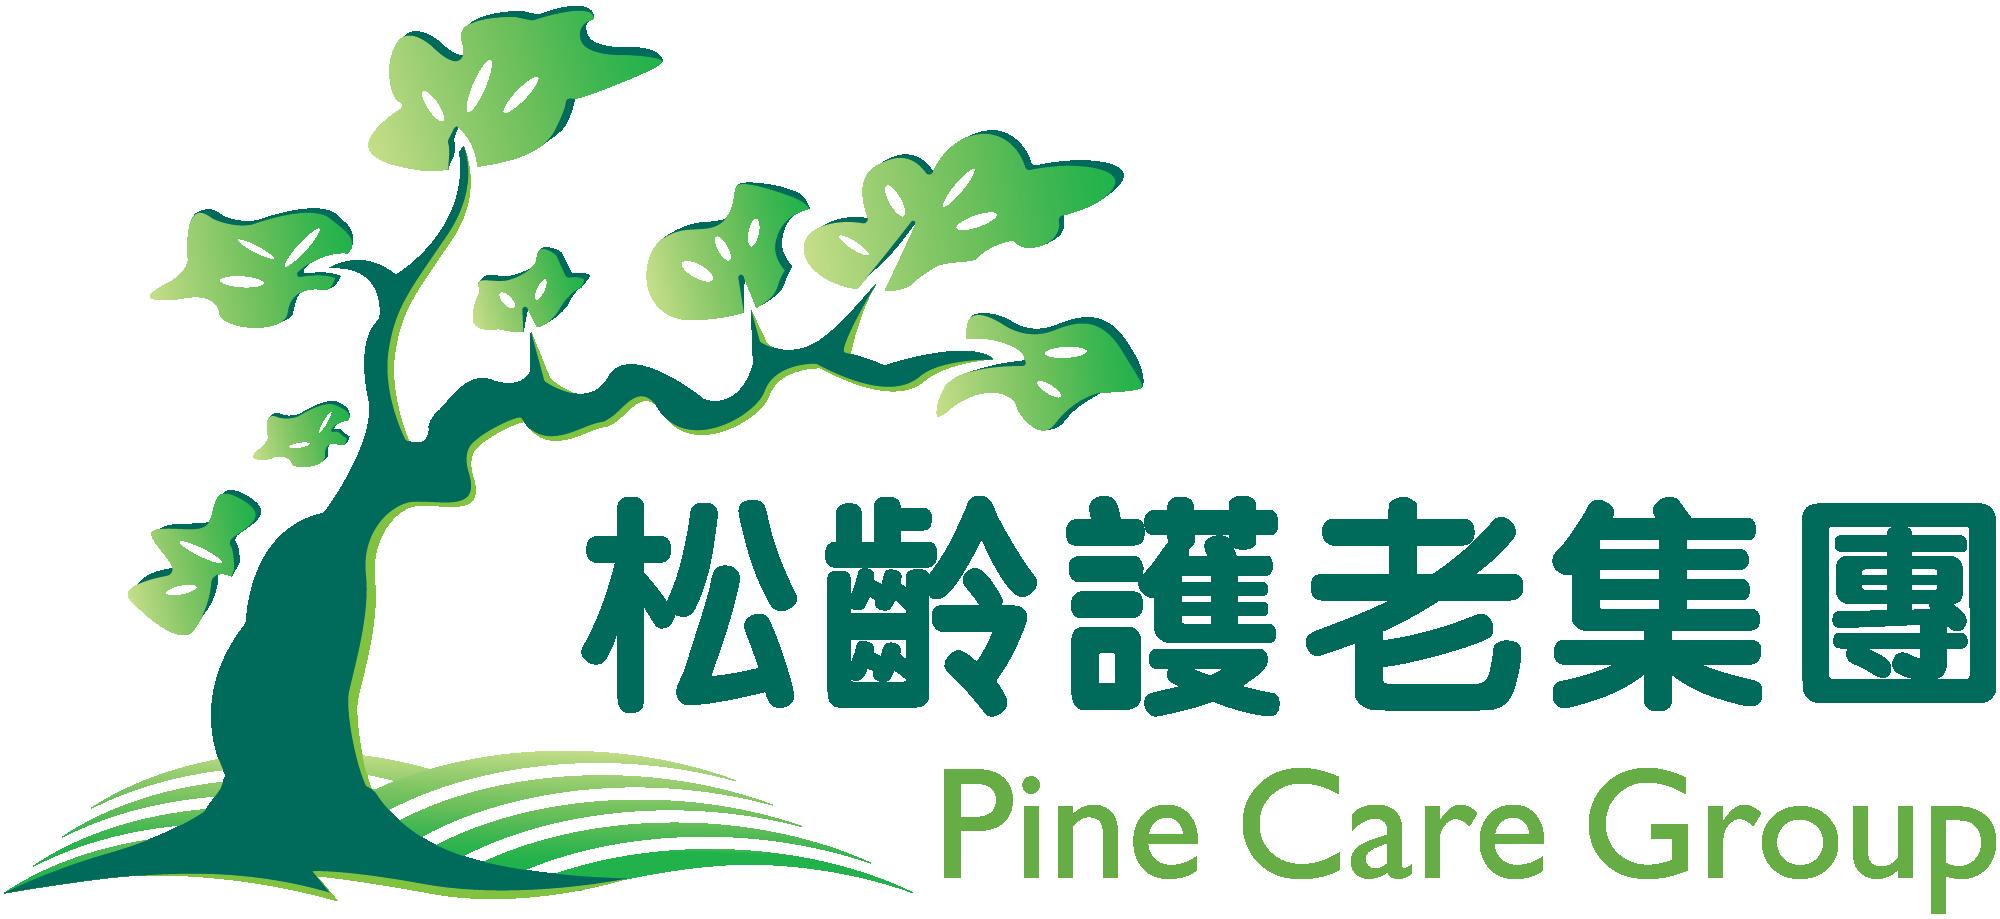 Pine Care Group